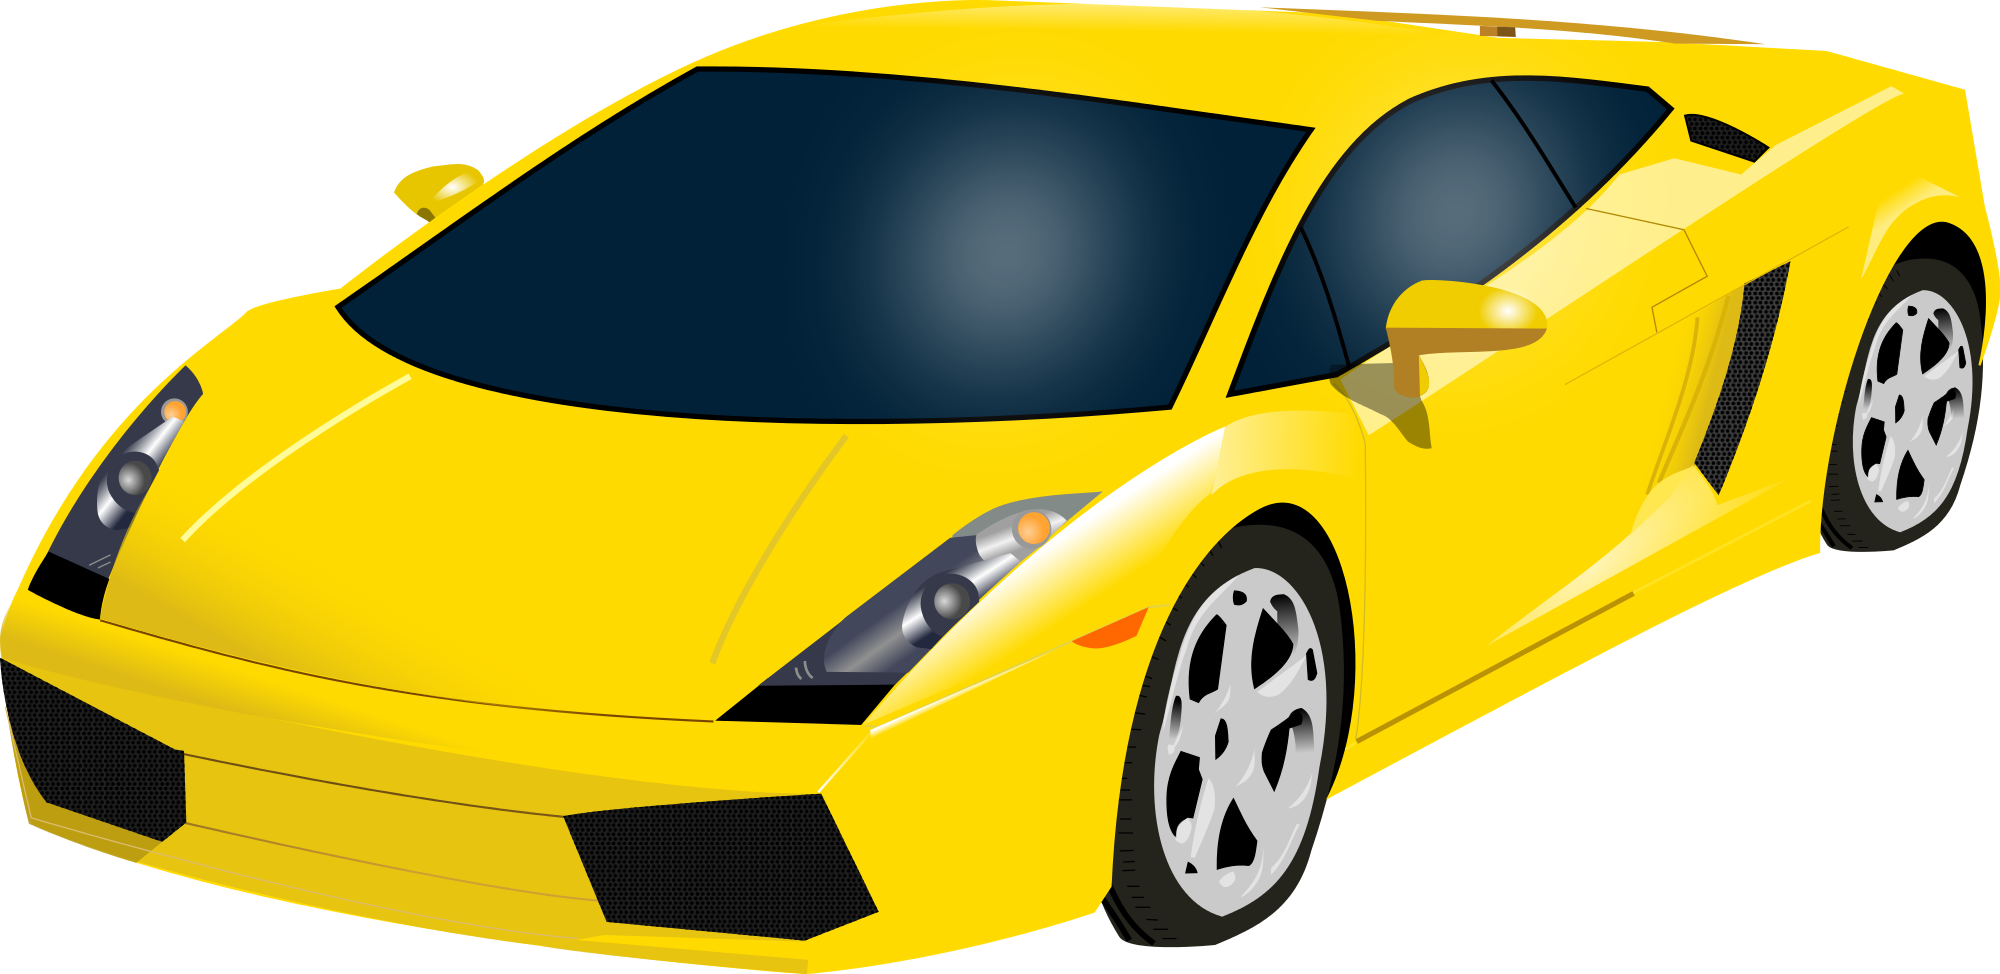 Sick car clipart picture freeuse download Lamborghini Clipart nice car - Free Clipart on Dumielauxepices.net picture freeuse download